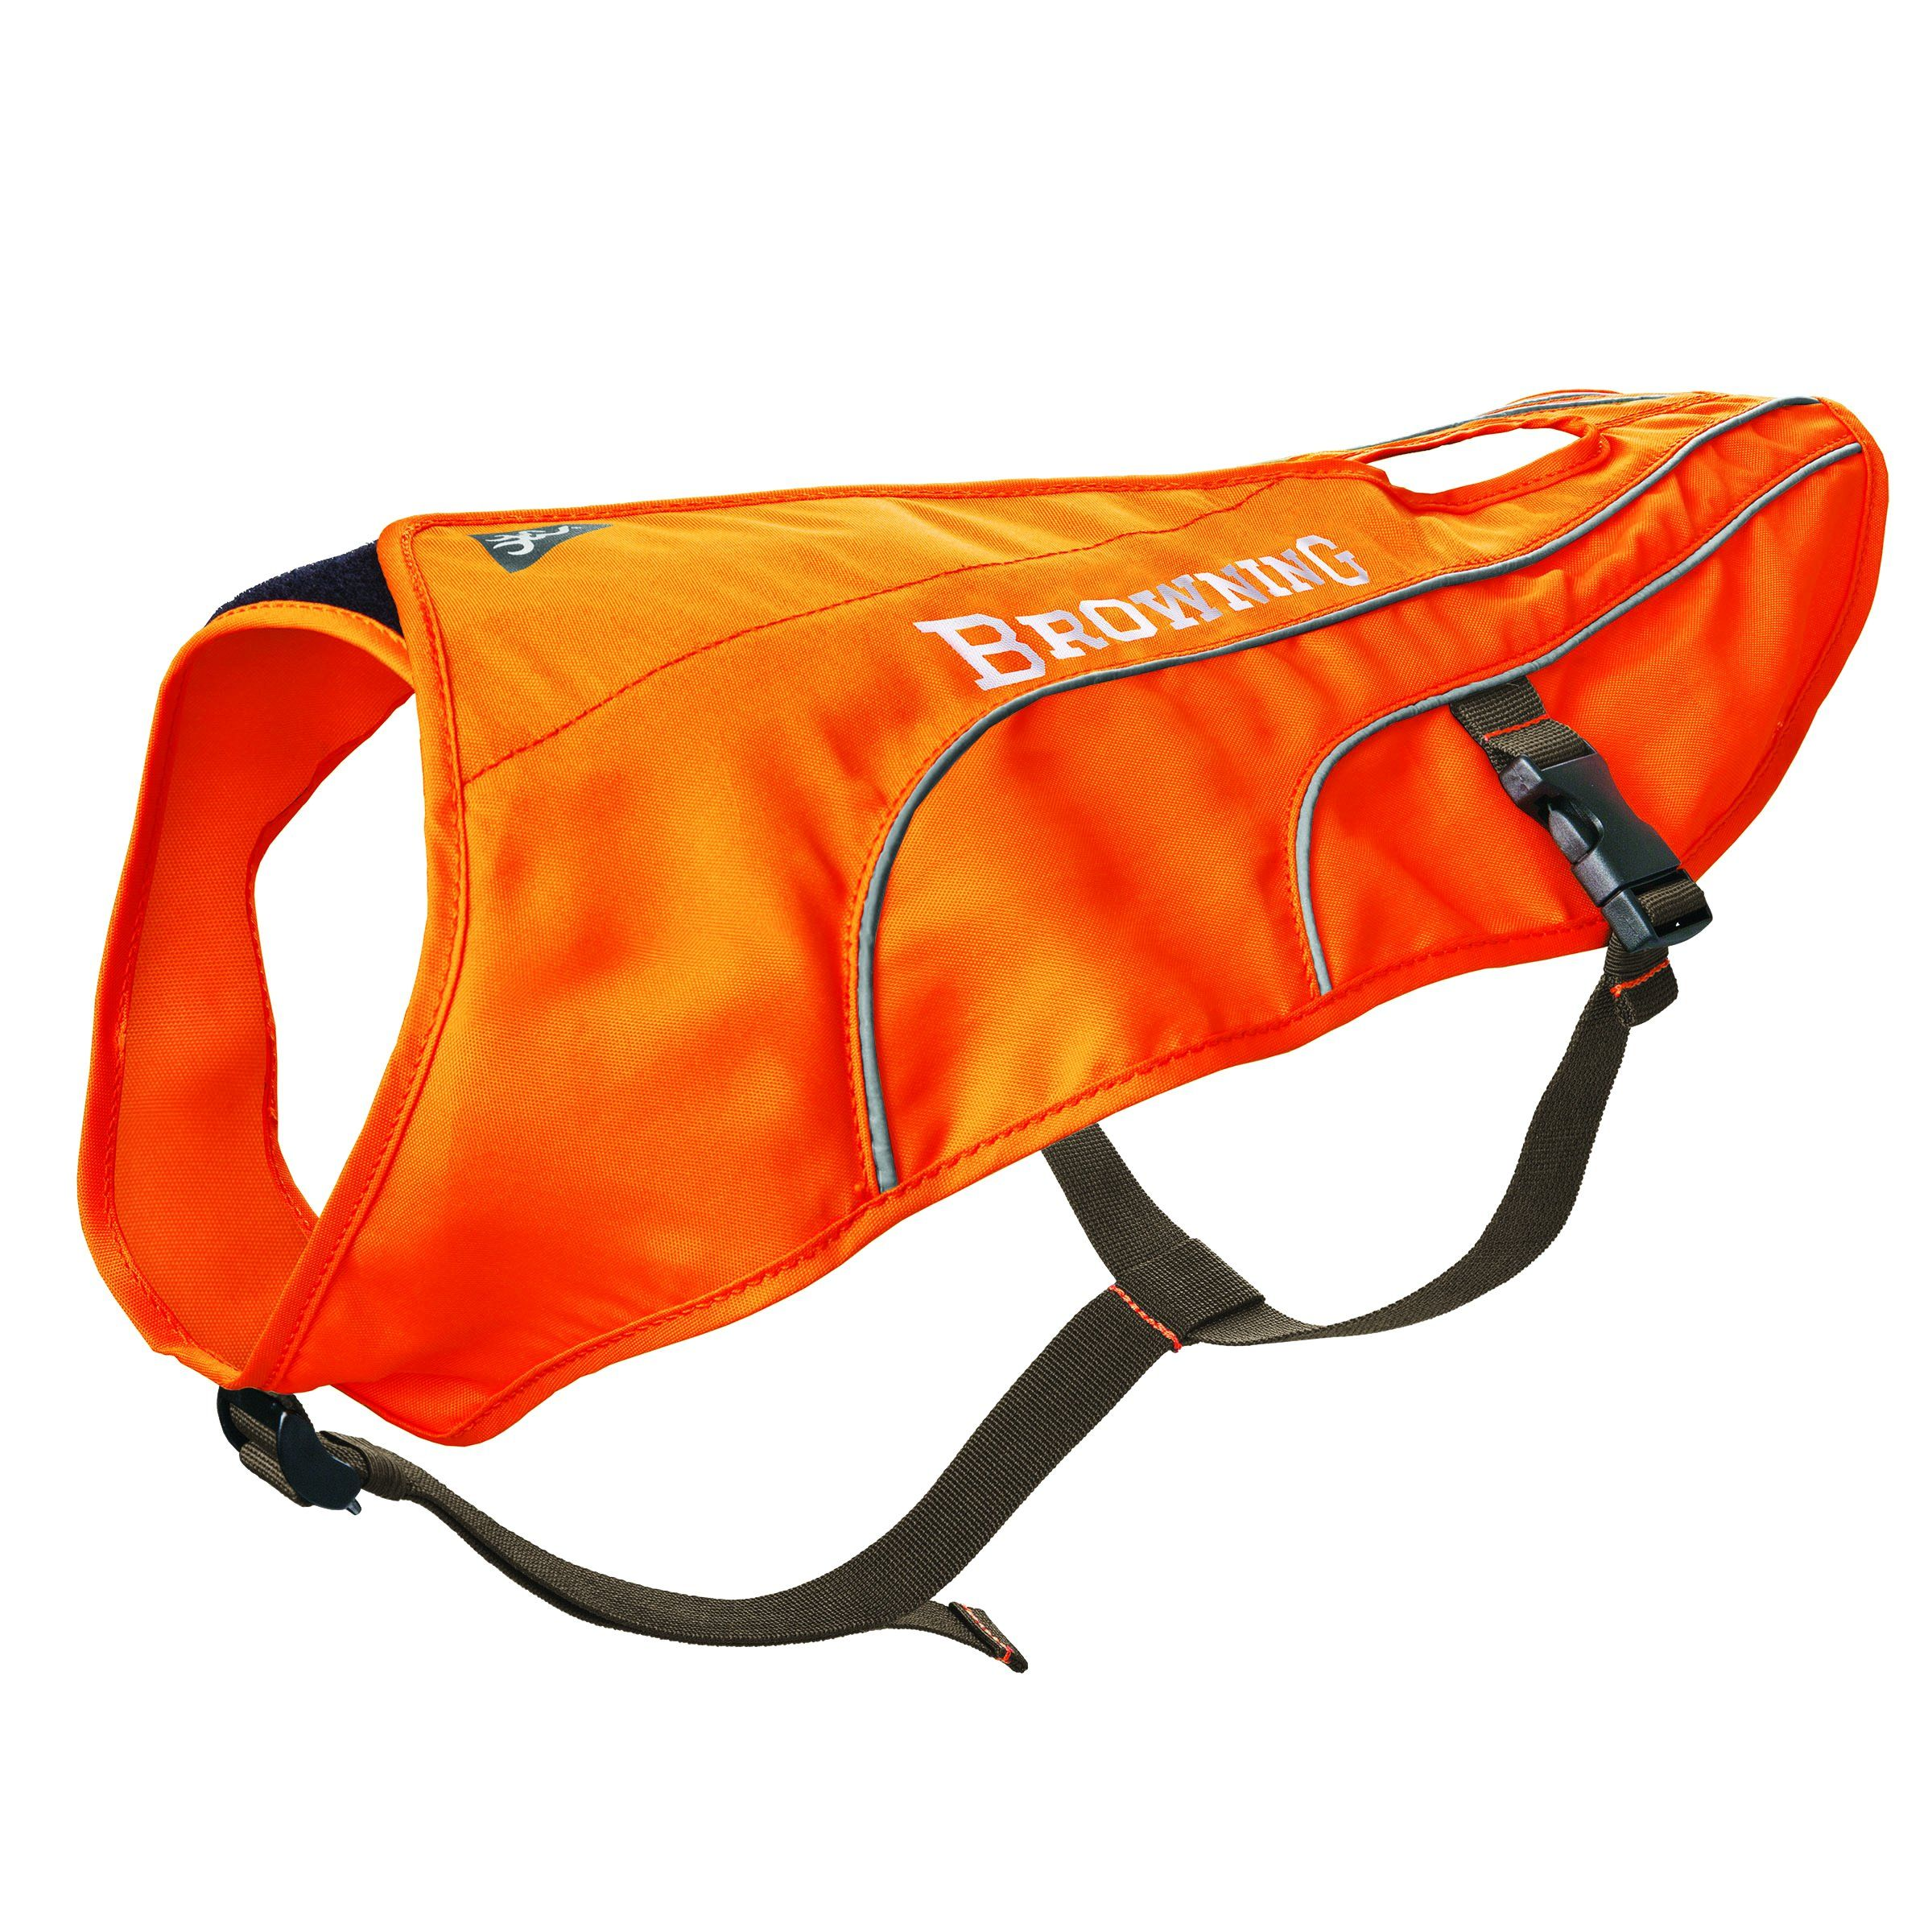 Browning technical dog vest safety orange small visit